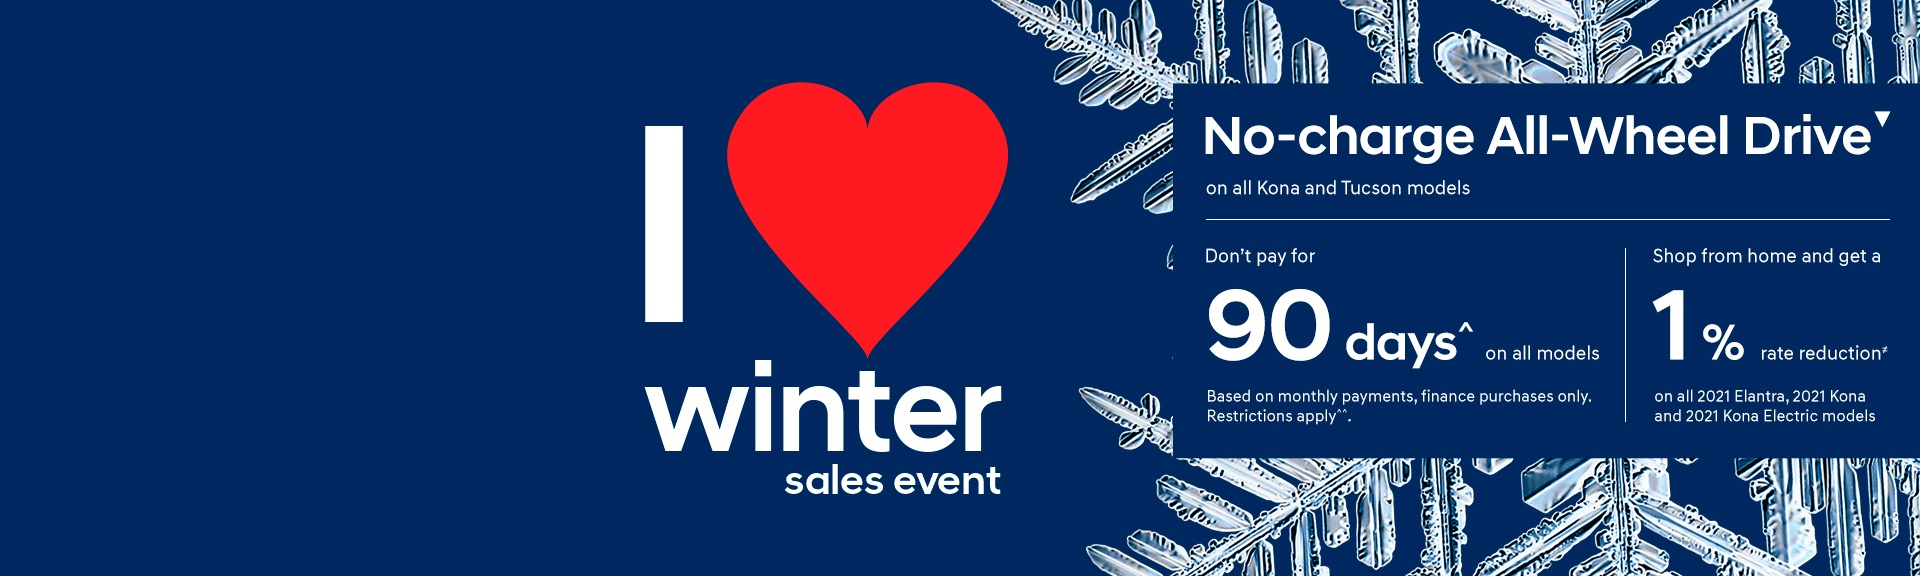 I-Love-Winter-Event-Banner